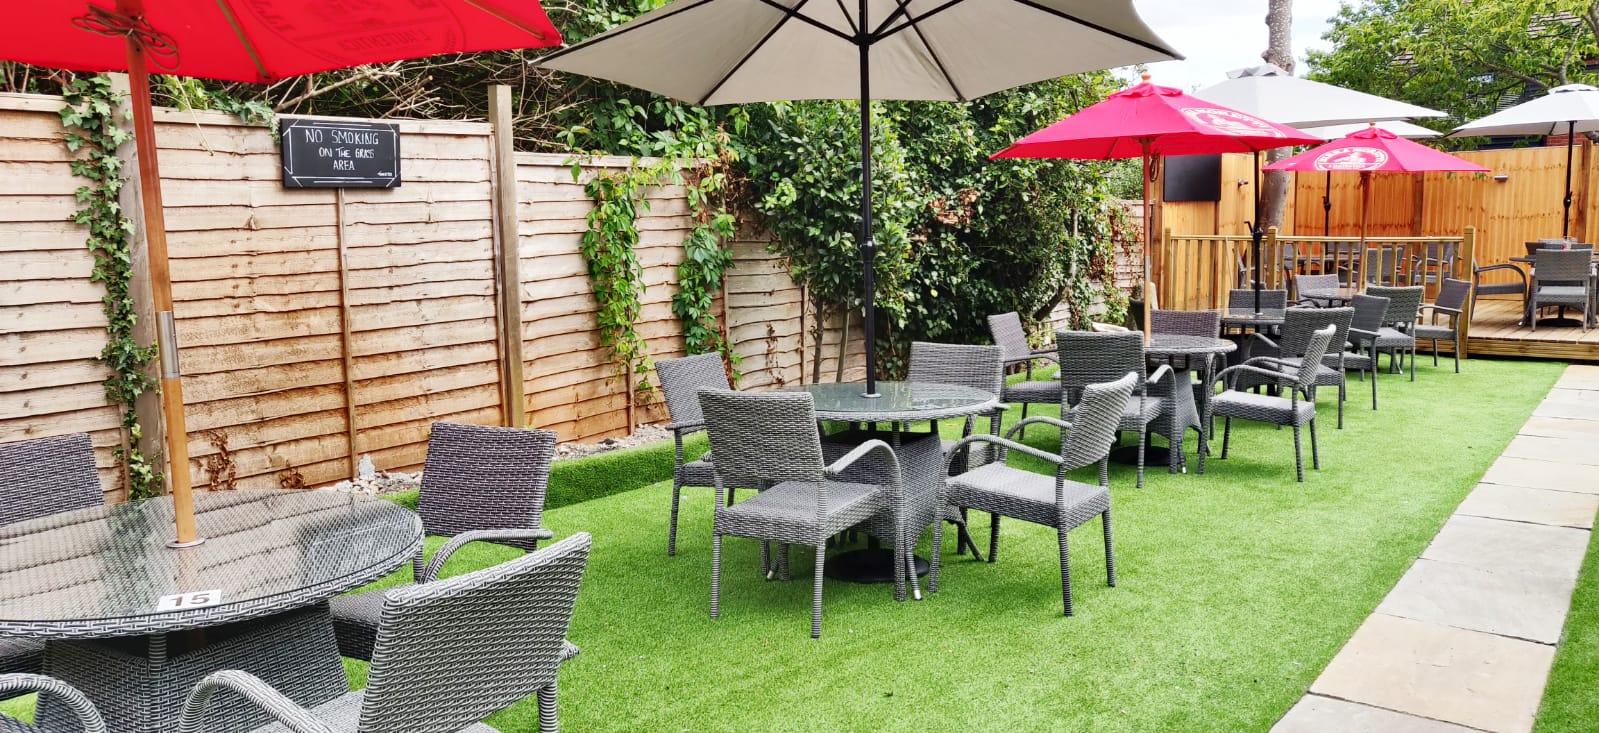 Our Garden Restaurant and Bar